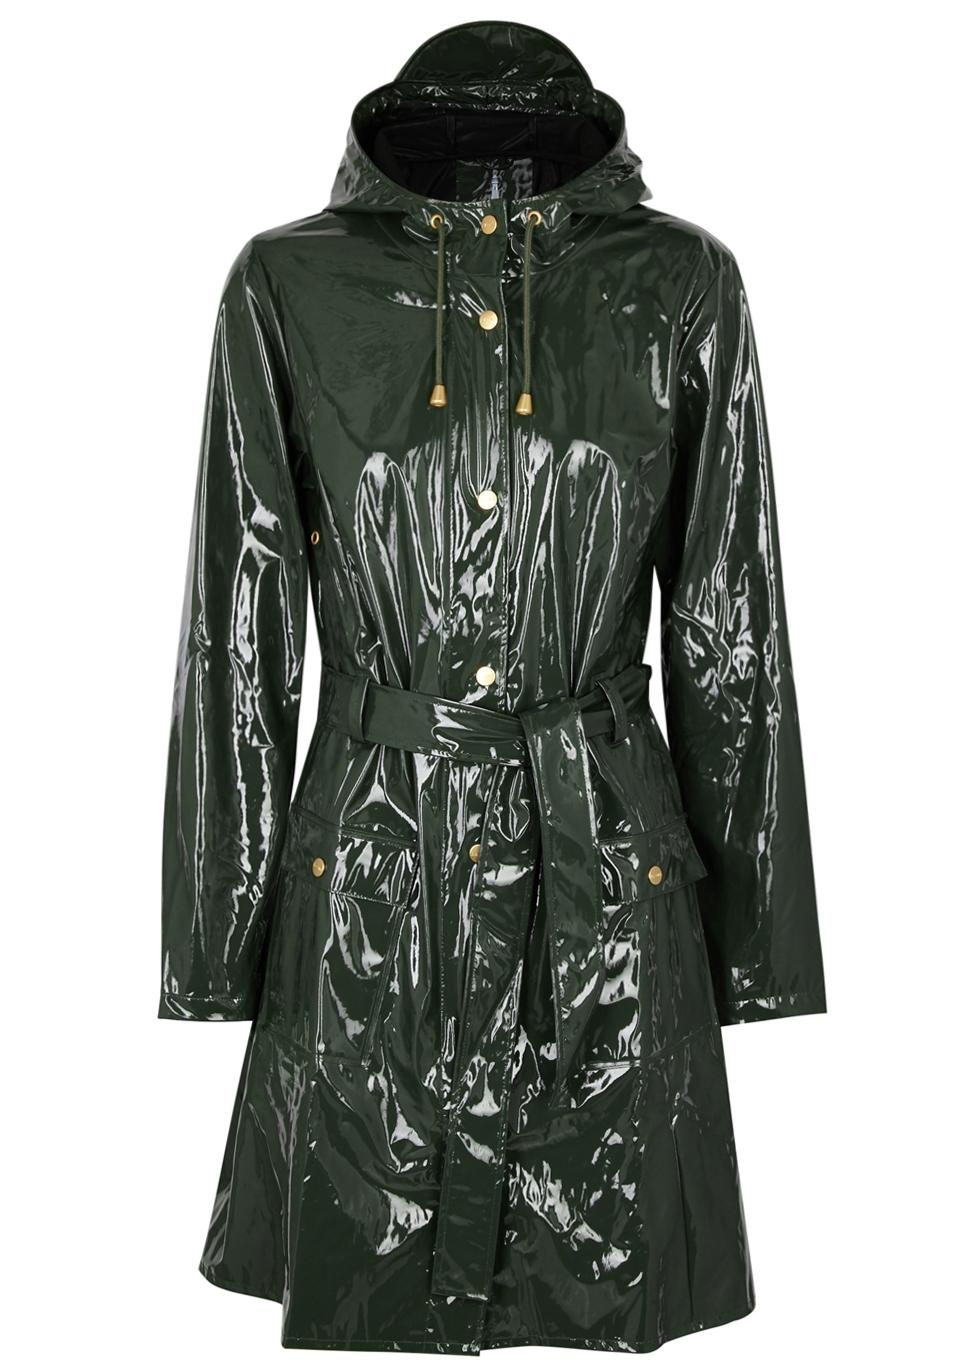 b8cbe4b3e Designer Coats - Women s Winter Coats - Harvey Nichols